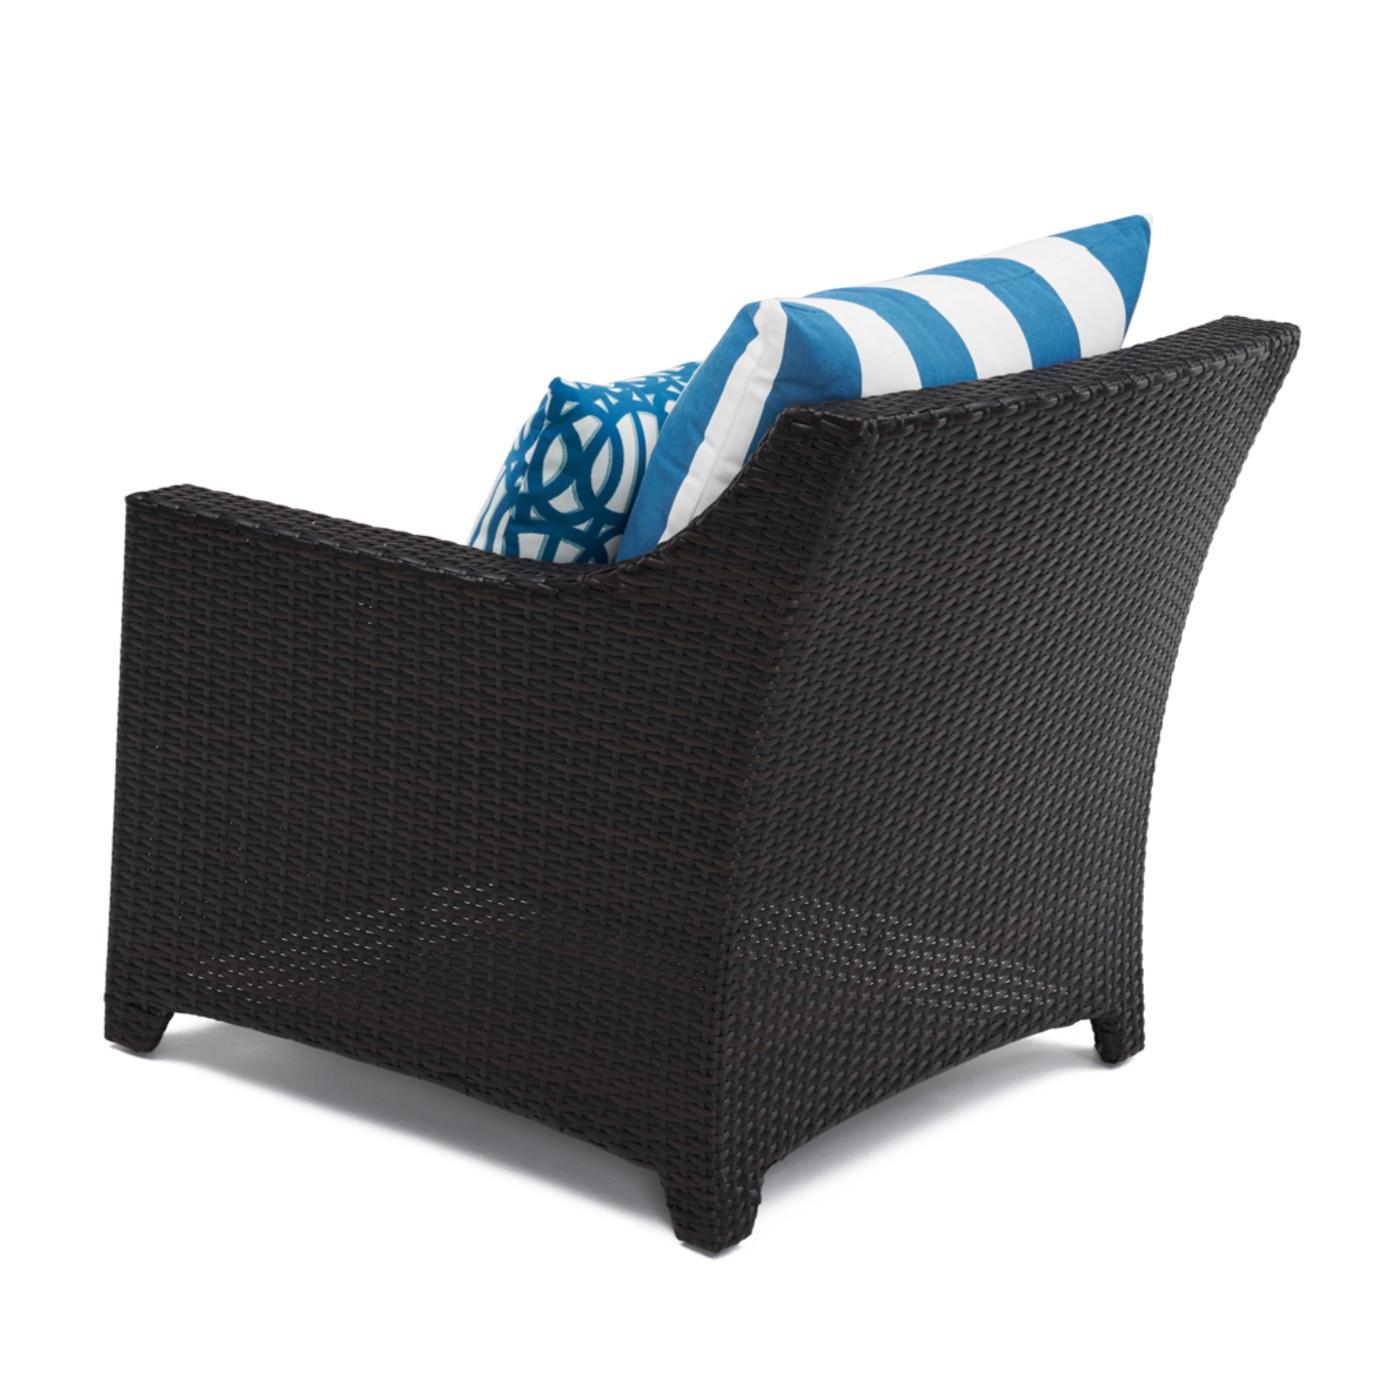 Deco™ 6pc Love and Club Seating Set - Regatta Blue